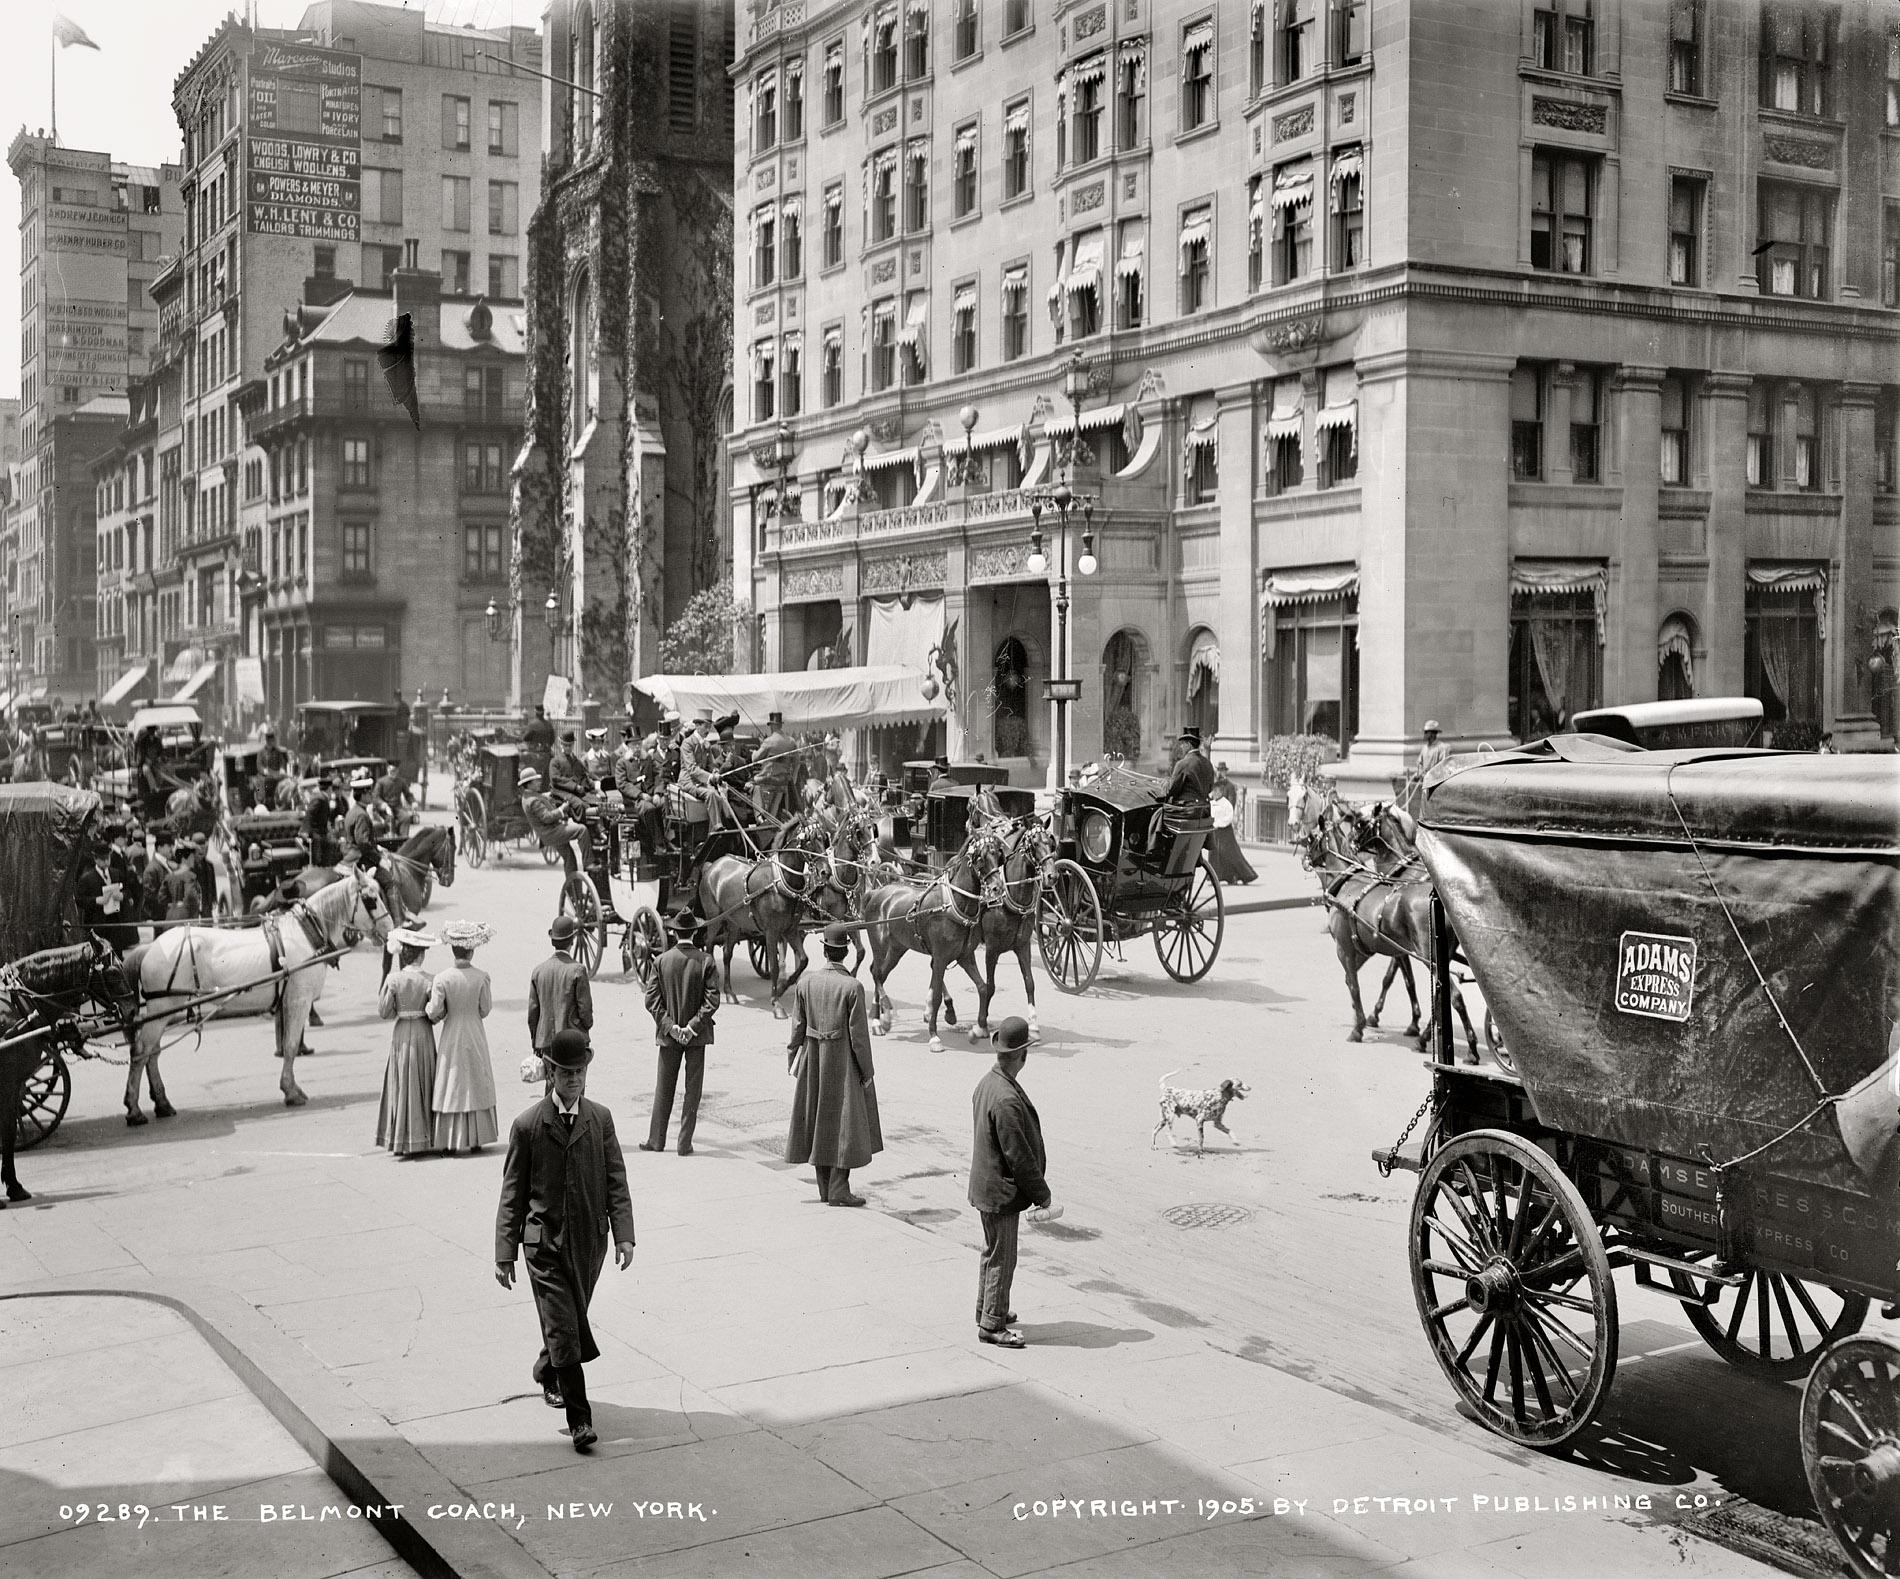 Shorpy Historic Picture Archive The Belmont Coach 1905